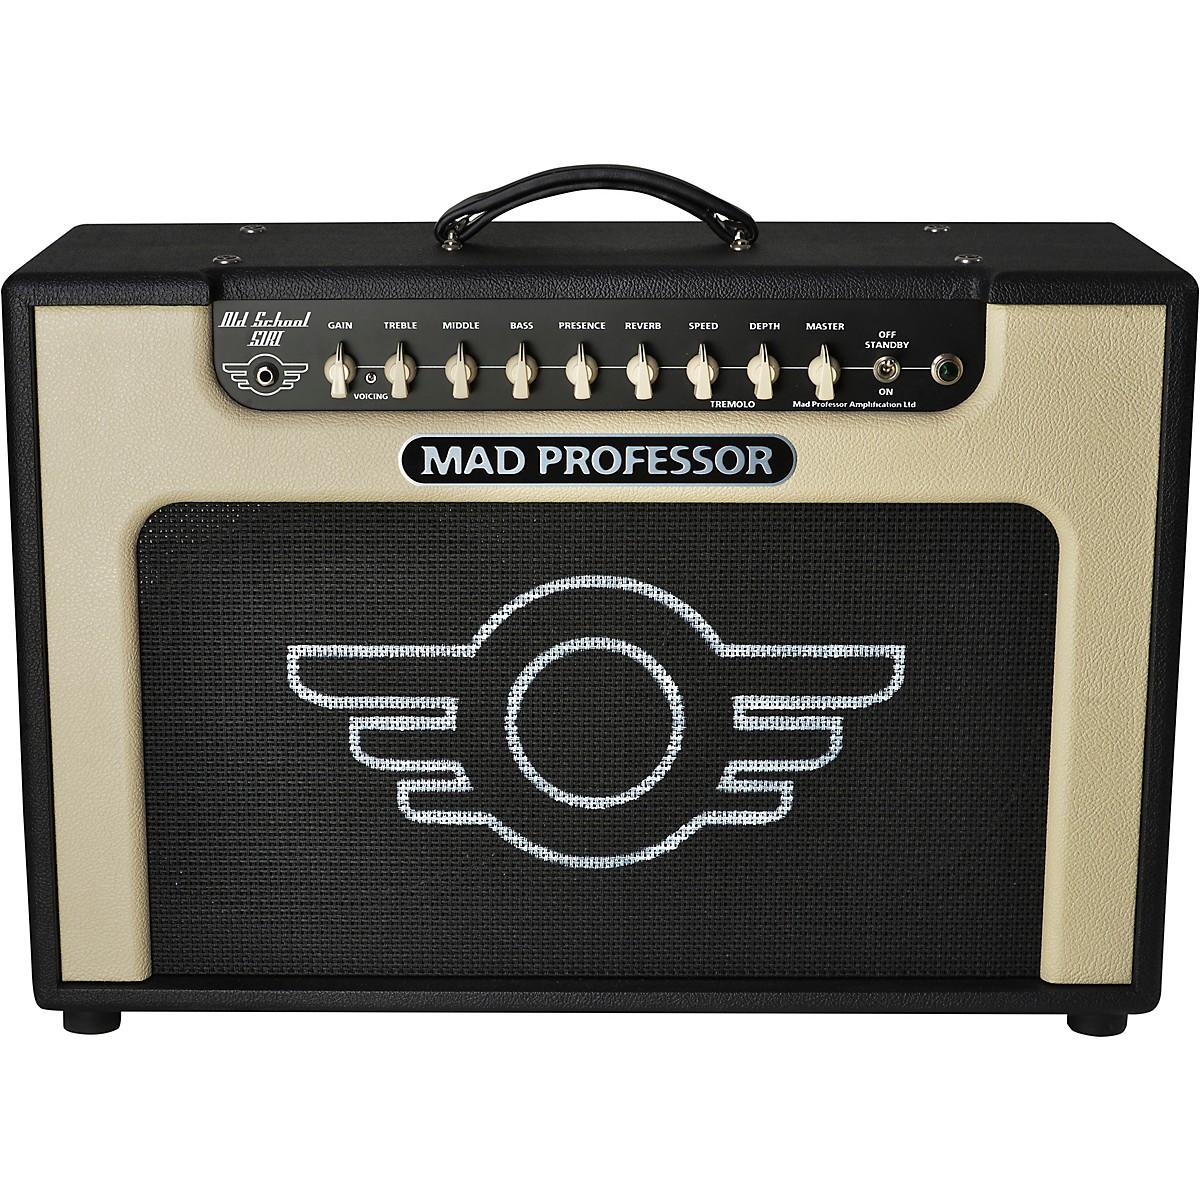 Mad Professor Old School 51 RT-2x12 51W 2x12 Tube Guitar Combo Amp